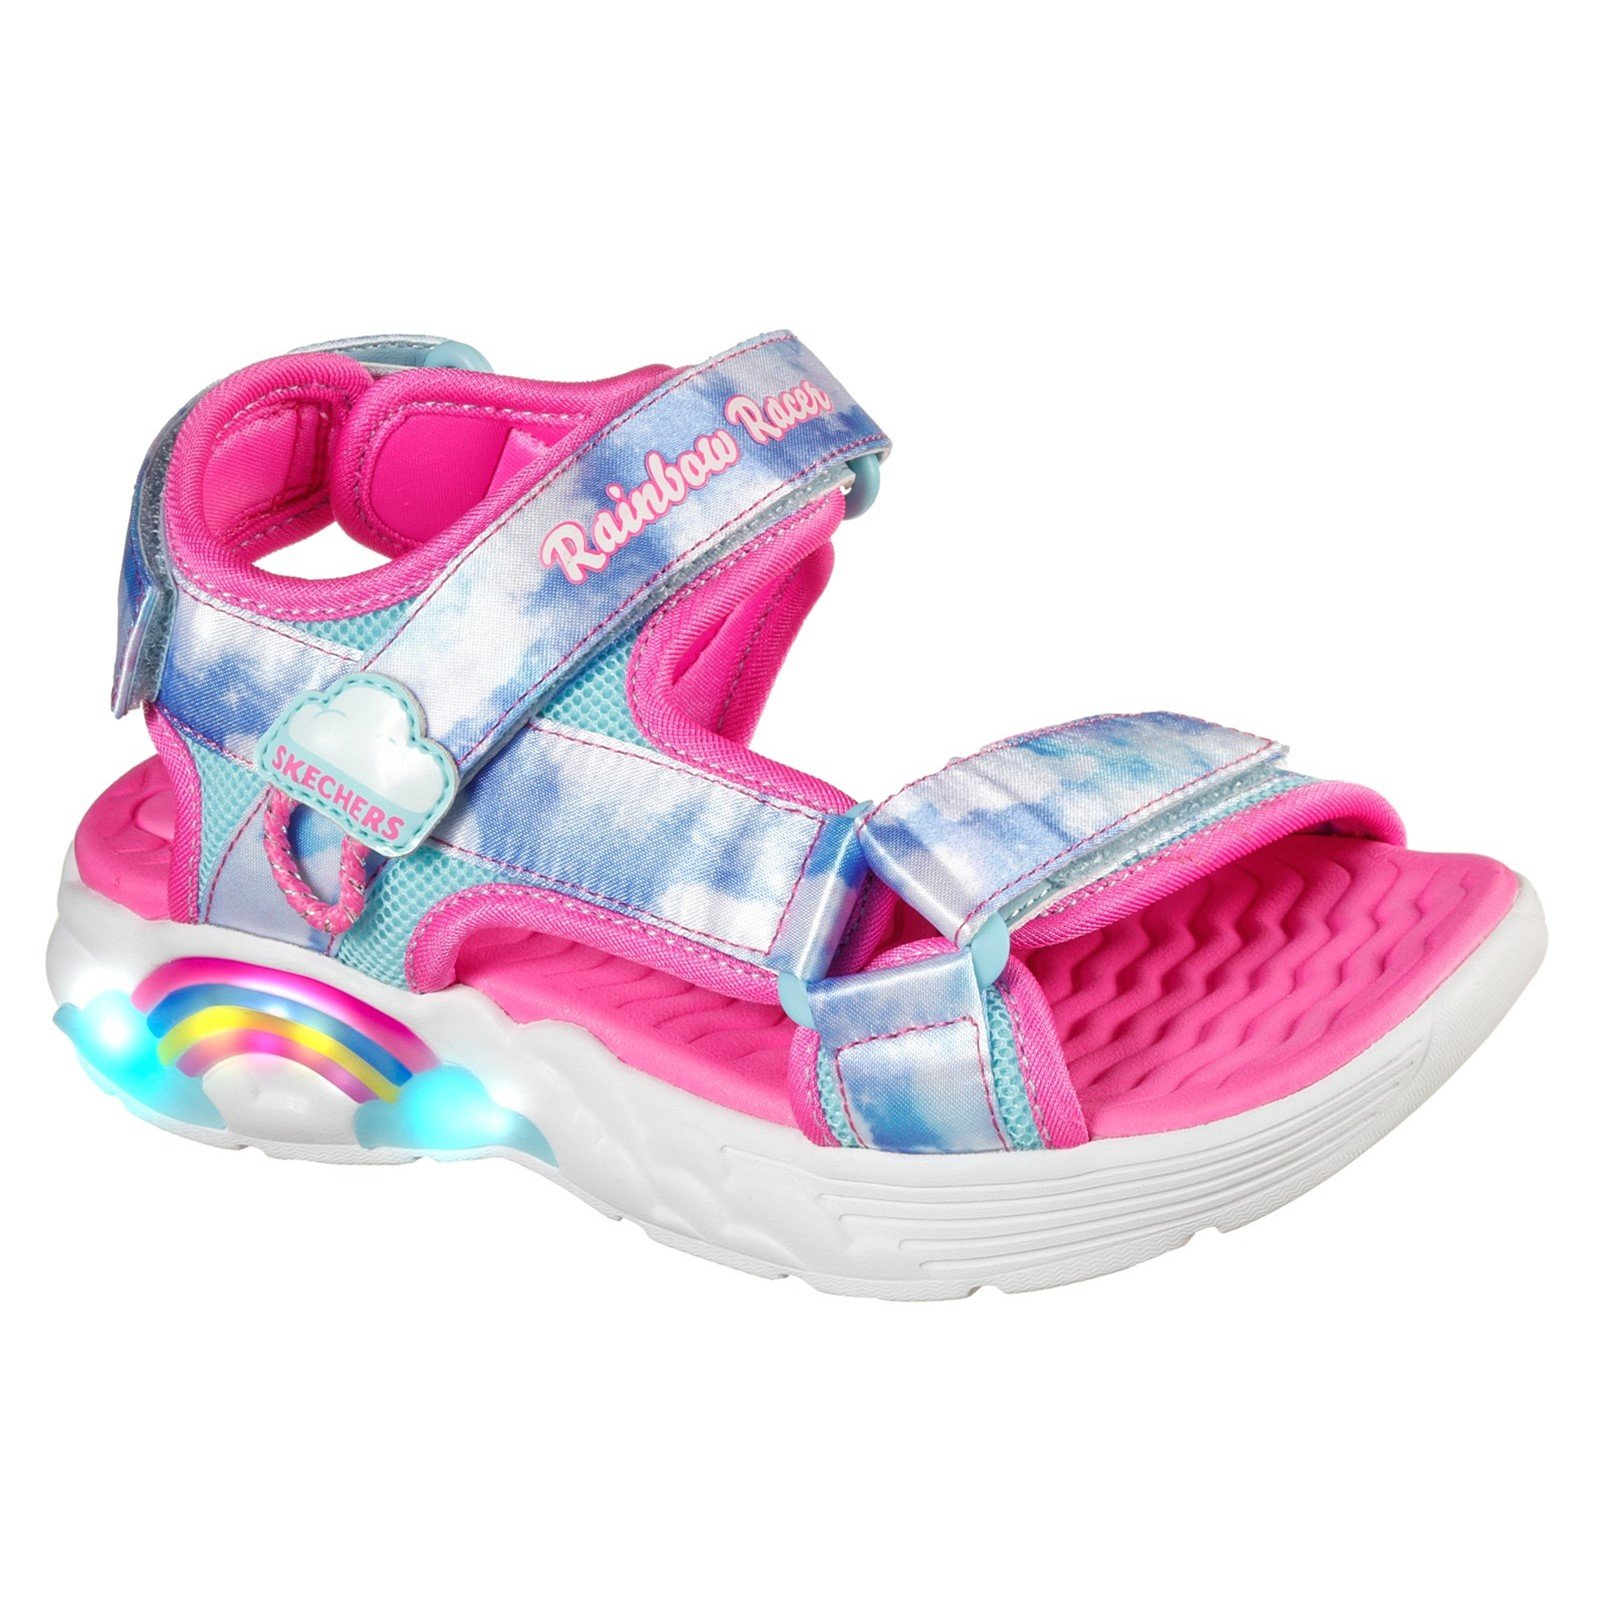 Skechers Unisex Rainbow Racer Summer Sky Beach Sandals Multicolor 32096 - Pink/Light Blue Pu 4